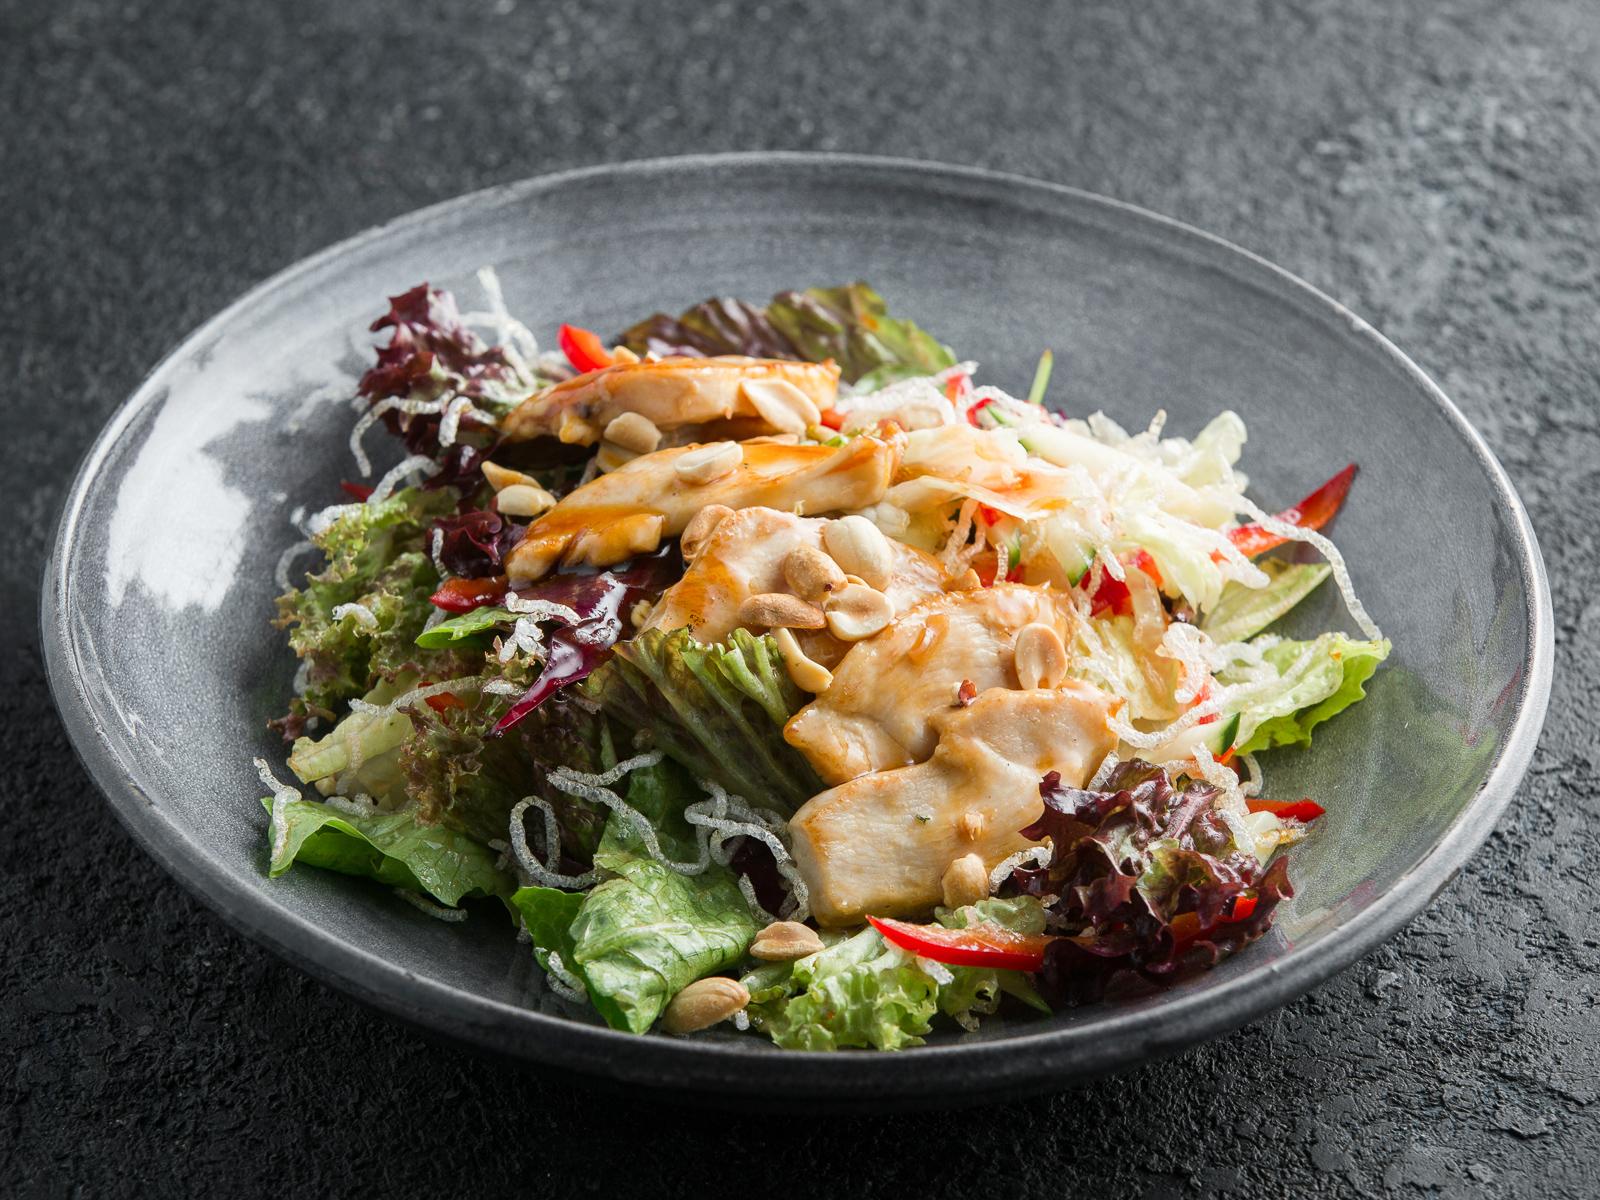 Тайский салат с курицей терияки и хрустящей фунчозой